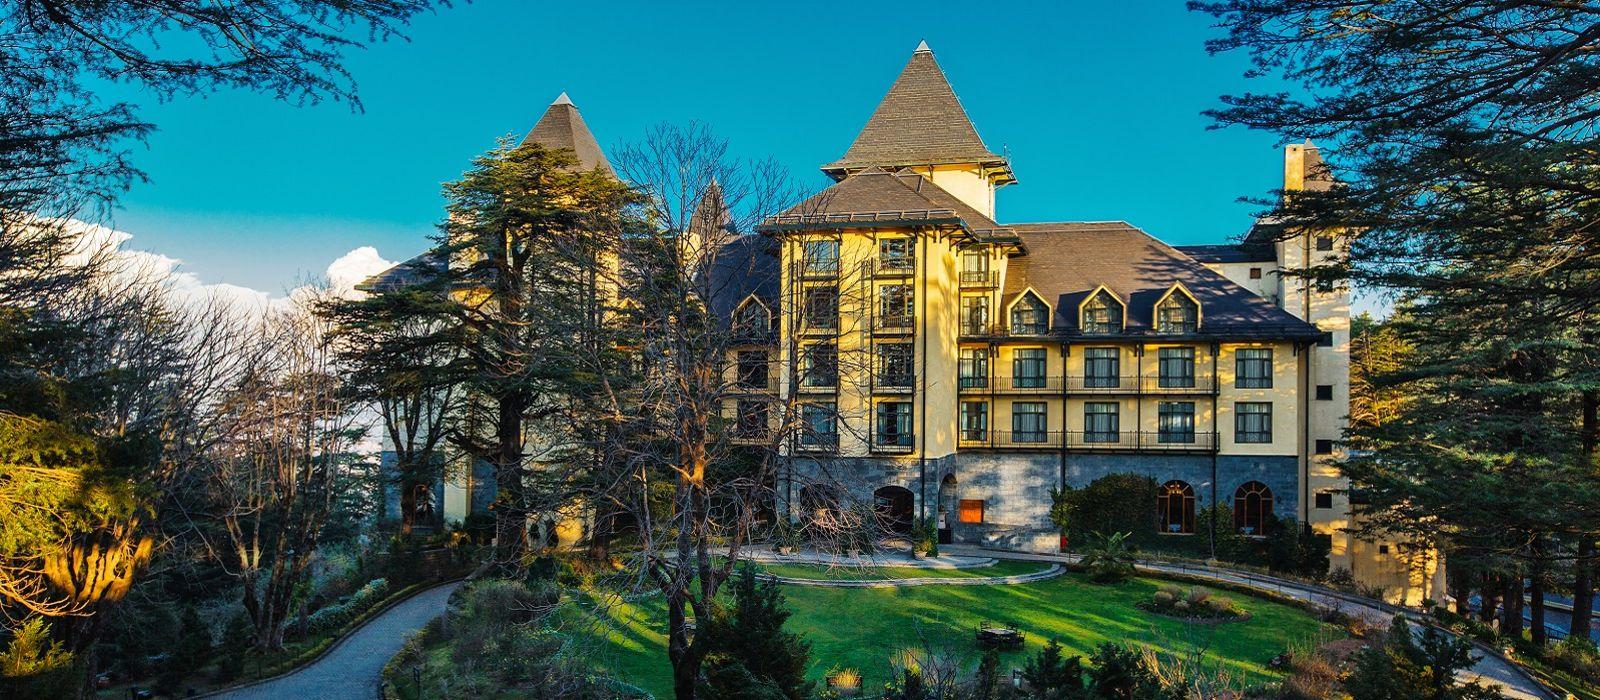 Das The Oberoi Hotels & Resorts Sommerangebot: Im Himalaya Gebirge Urlaub 4